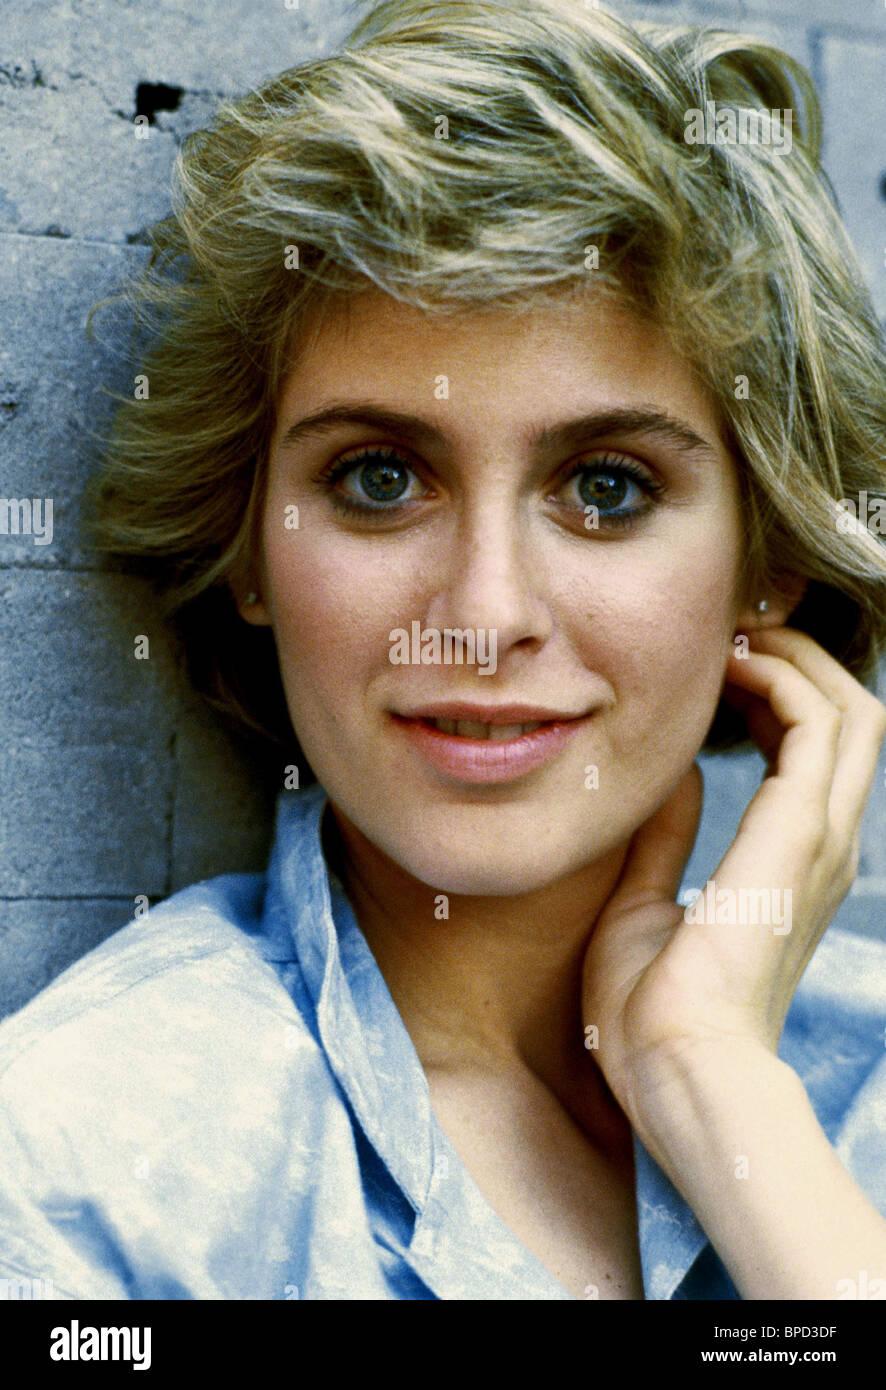 HELEN SLATER THE SECRET OF MY SUCCESS (1987)